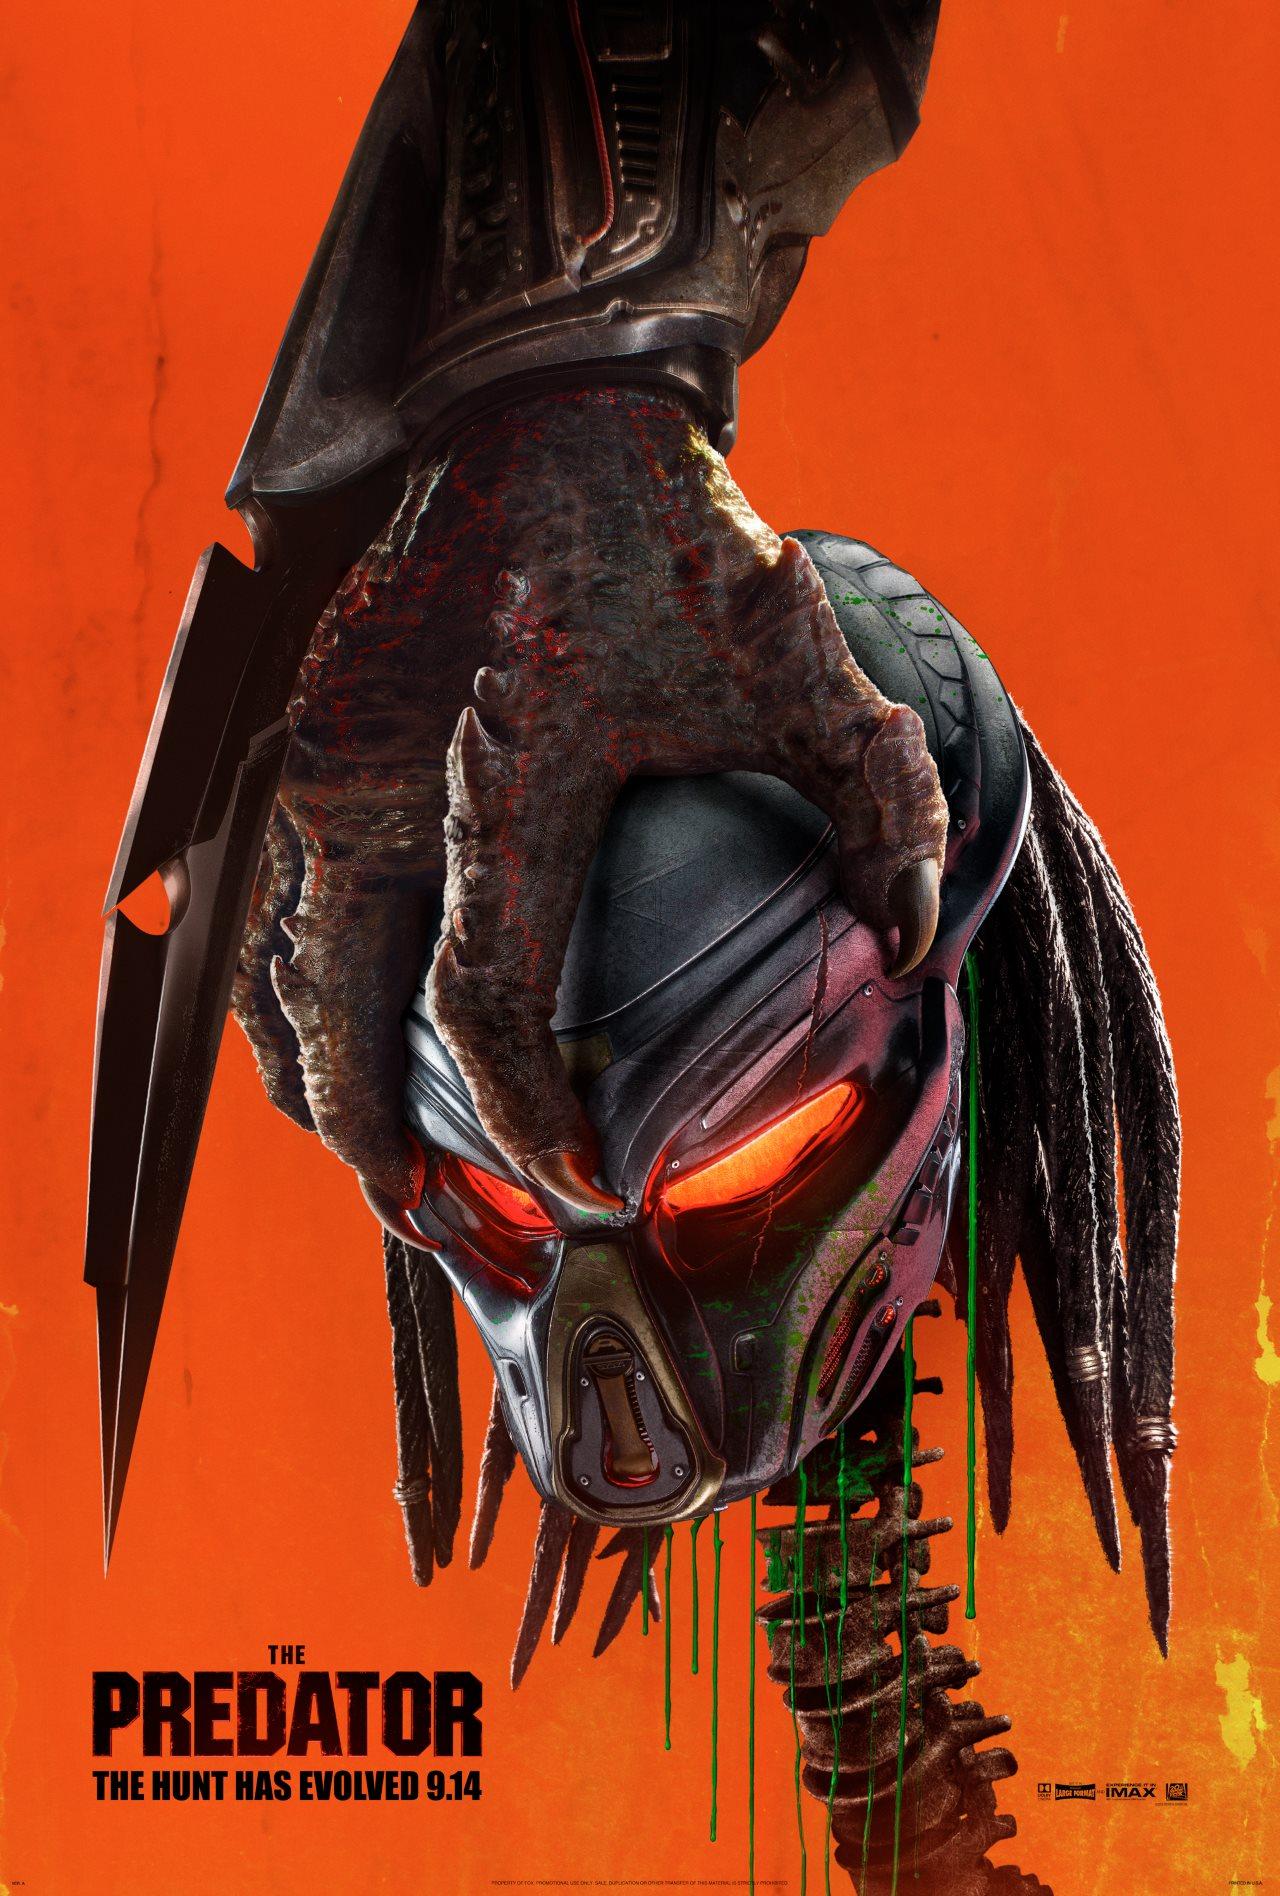 the predator poster The Predator